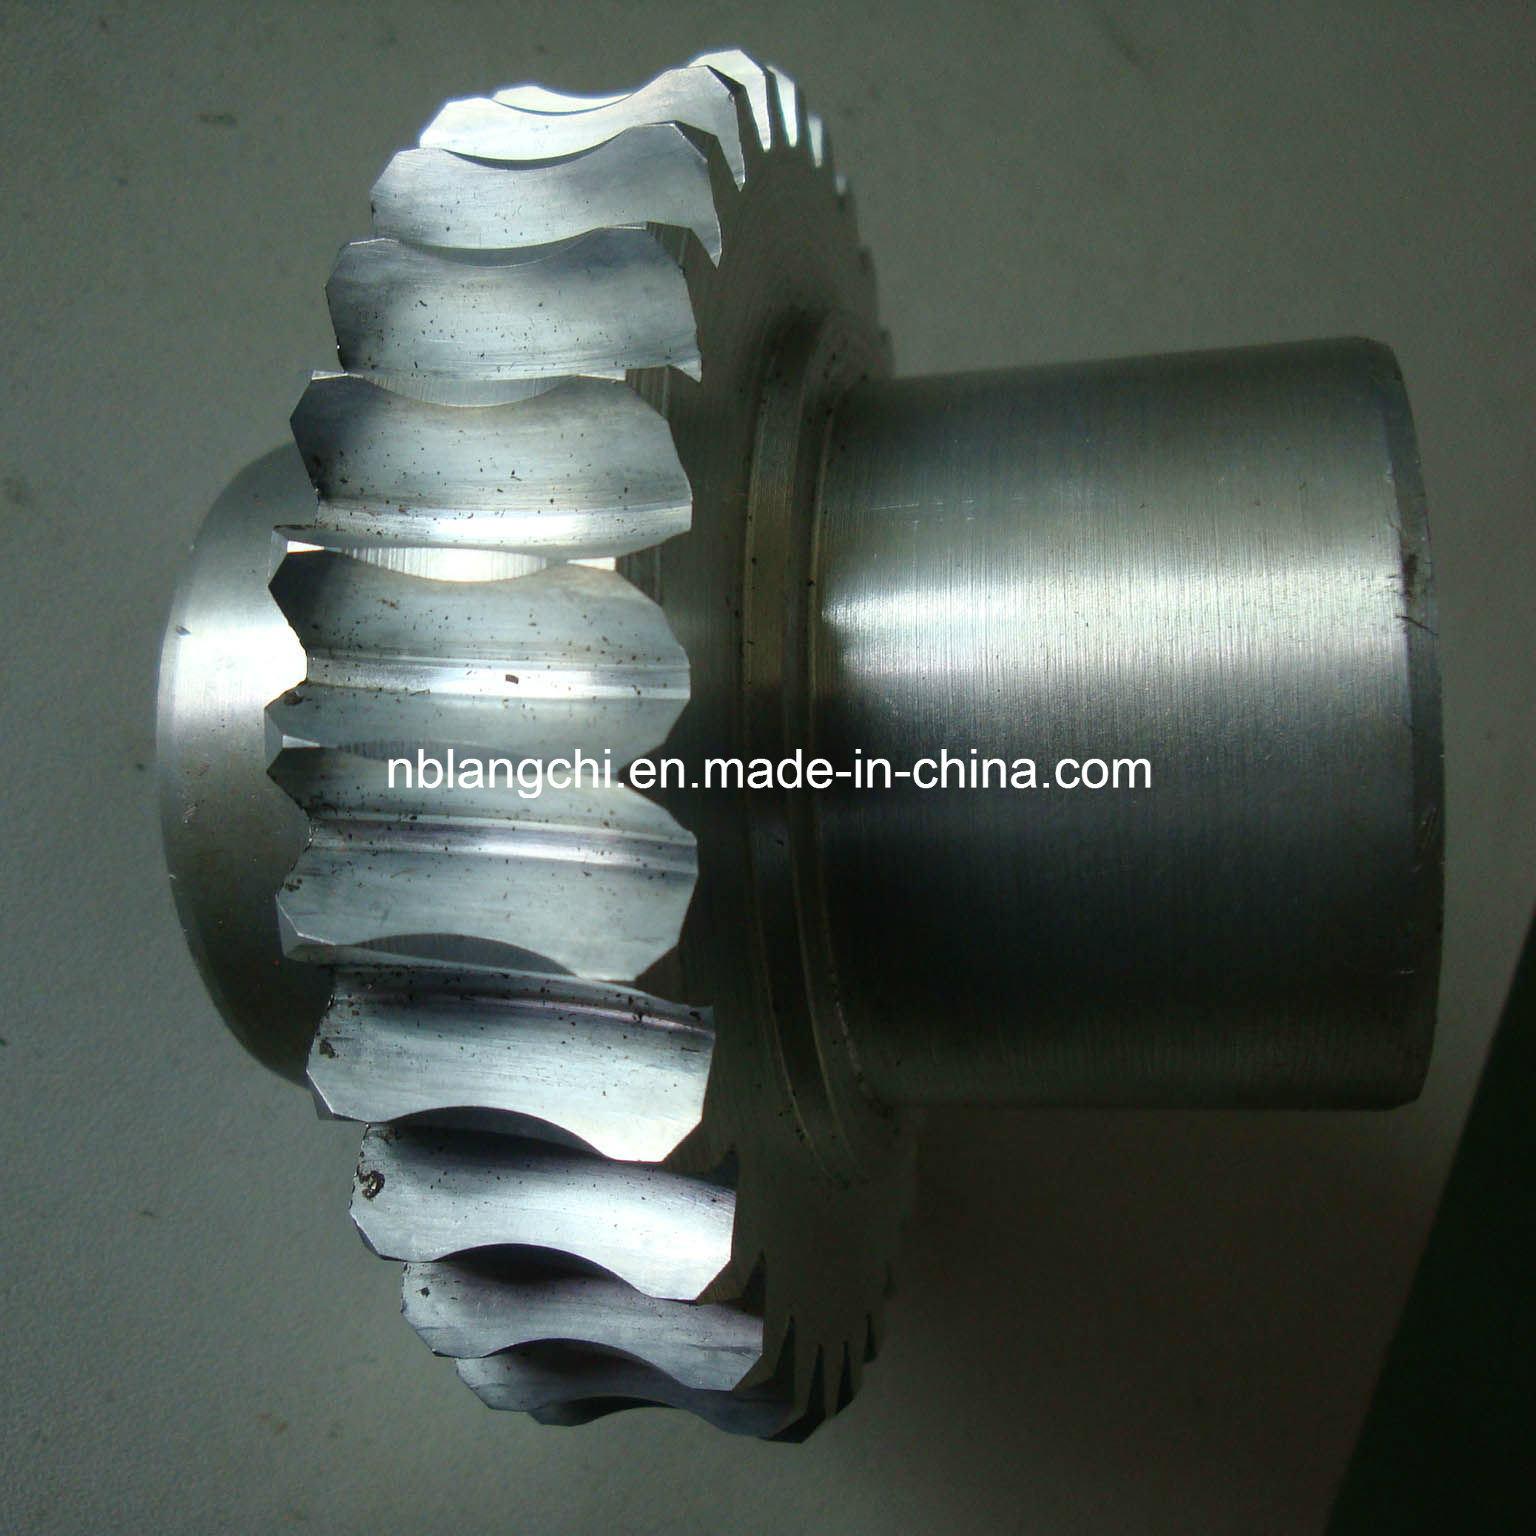 Customized Trapezoidal Zinc Alloy Curved Worm Wheel Gear Nuts Tr40X7